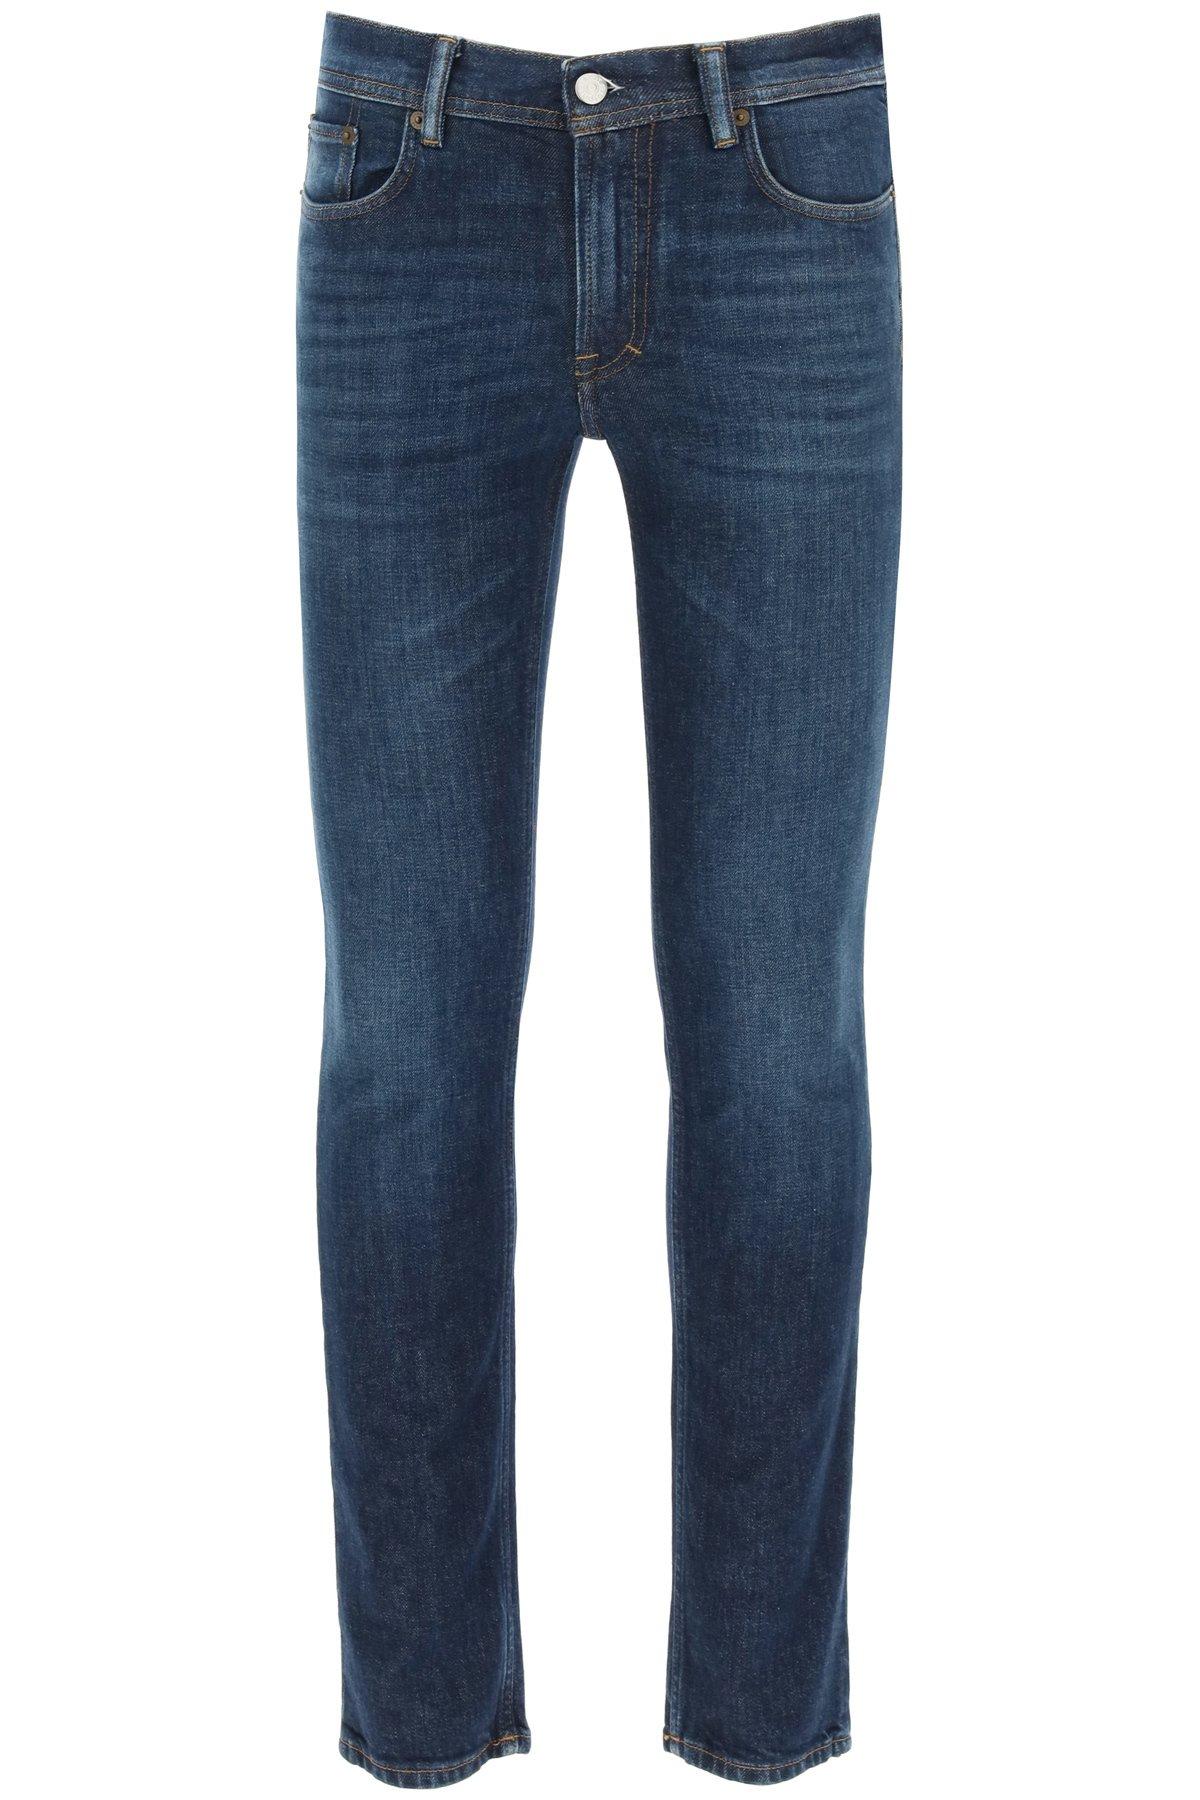 Acne studios jeans denim north